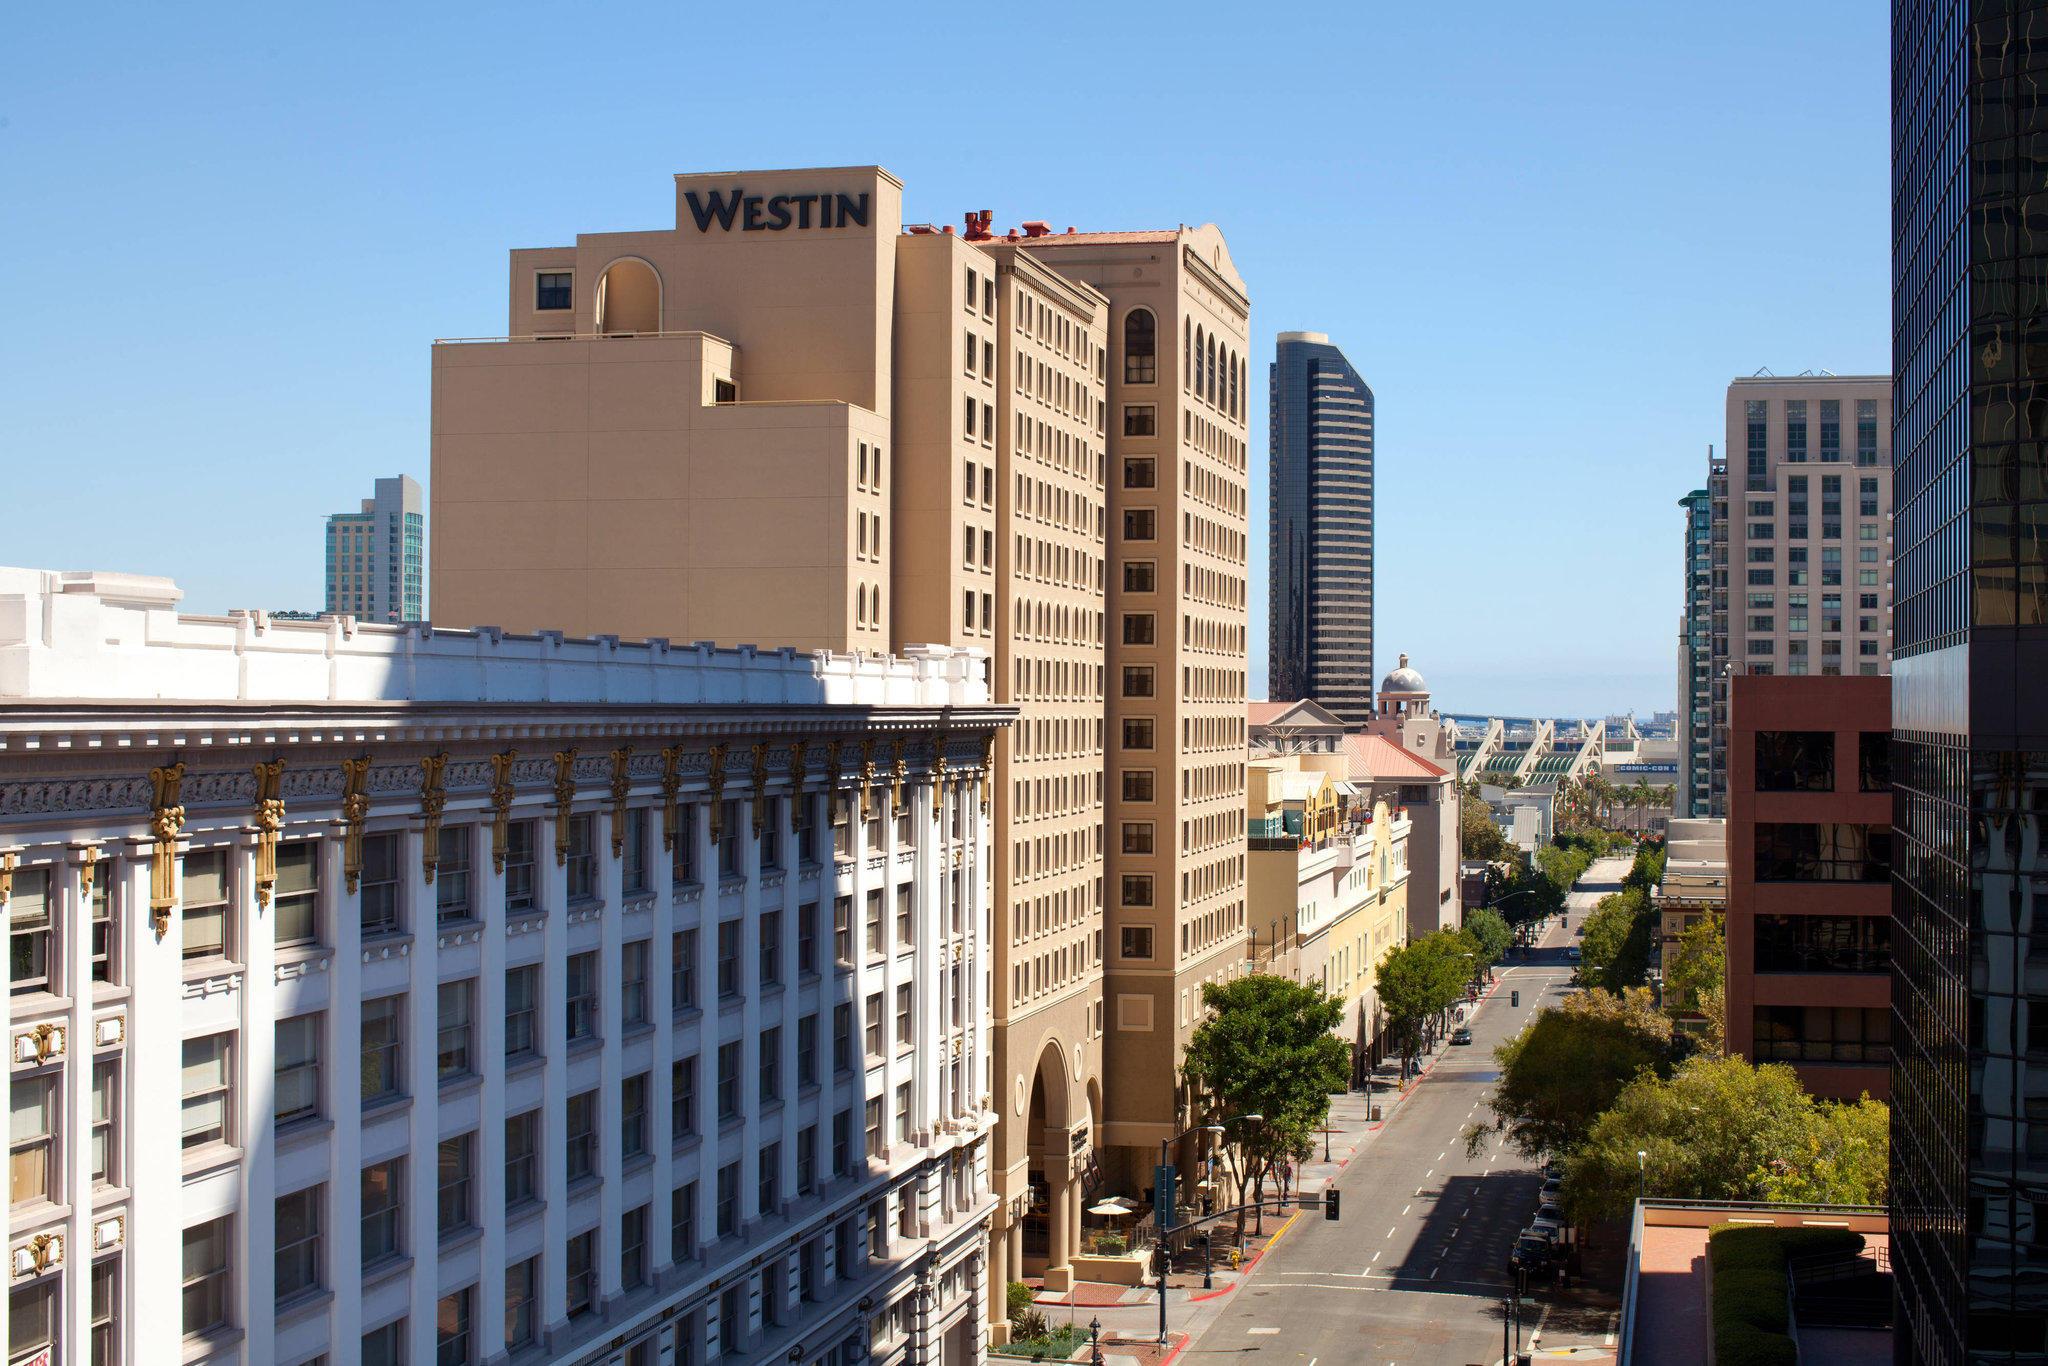 The Westin San Diego Gaslamp Quarter